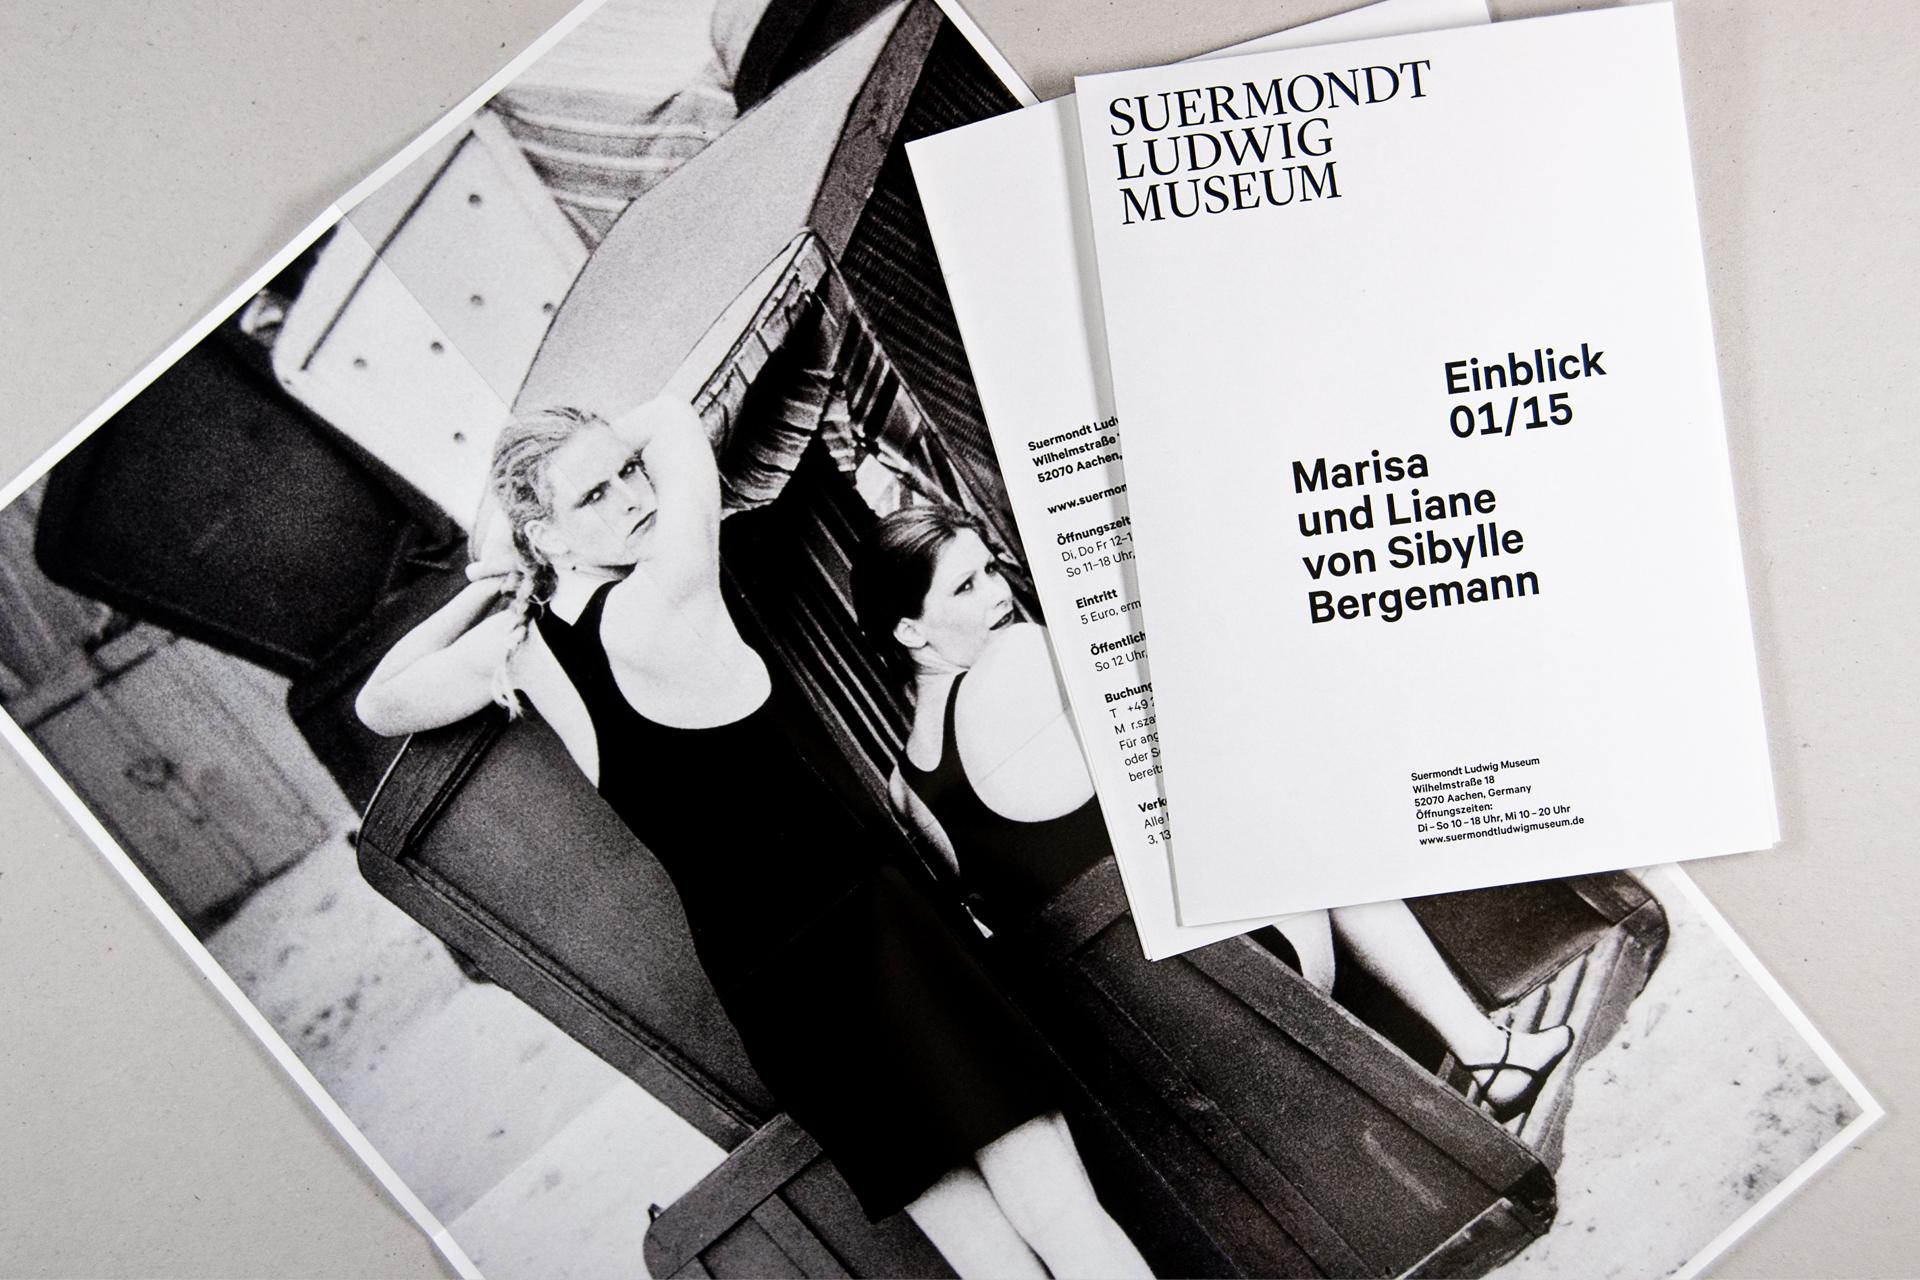 Katarina_Lueth_Suermondt-Ludwig-Museum_003